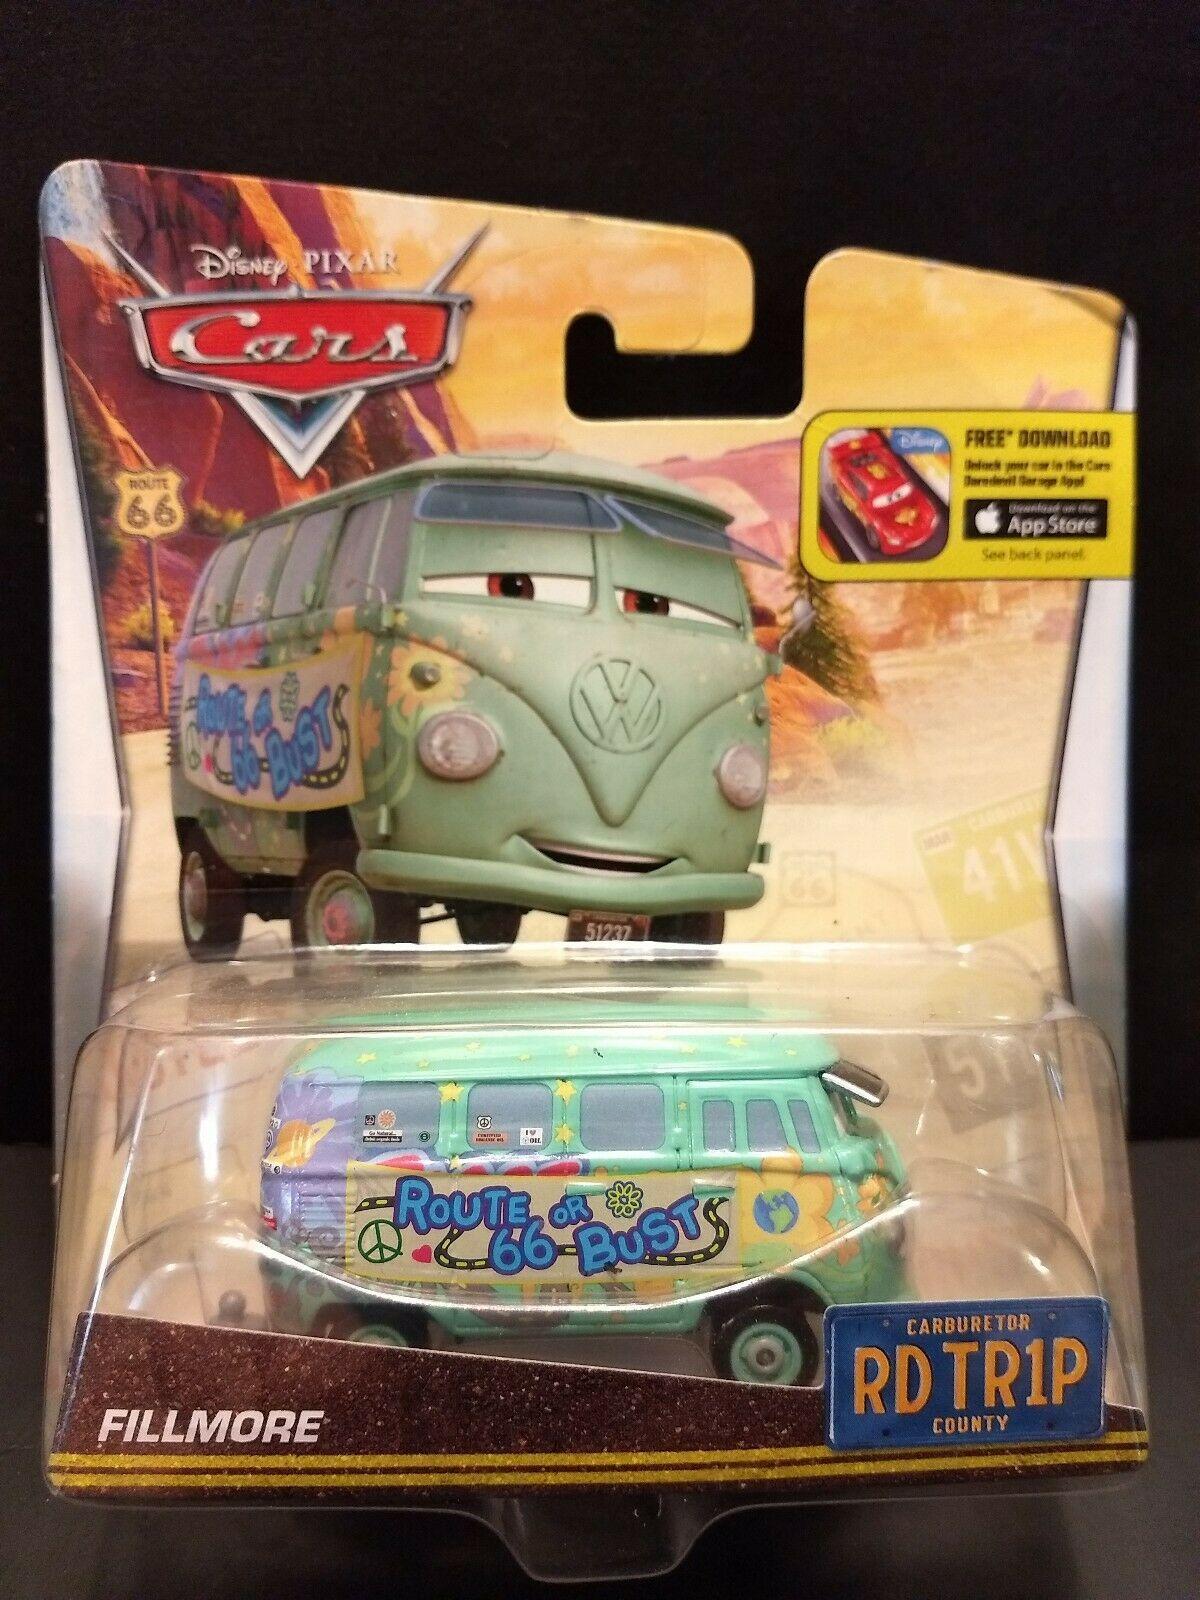 Sealed 2015 Mattel Pixar Disney Cars Fillmore Road Trip toy van Route 66 or Bust image 4